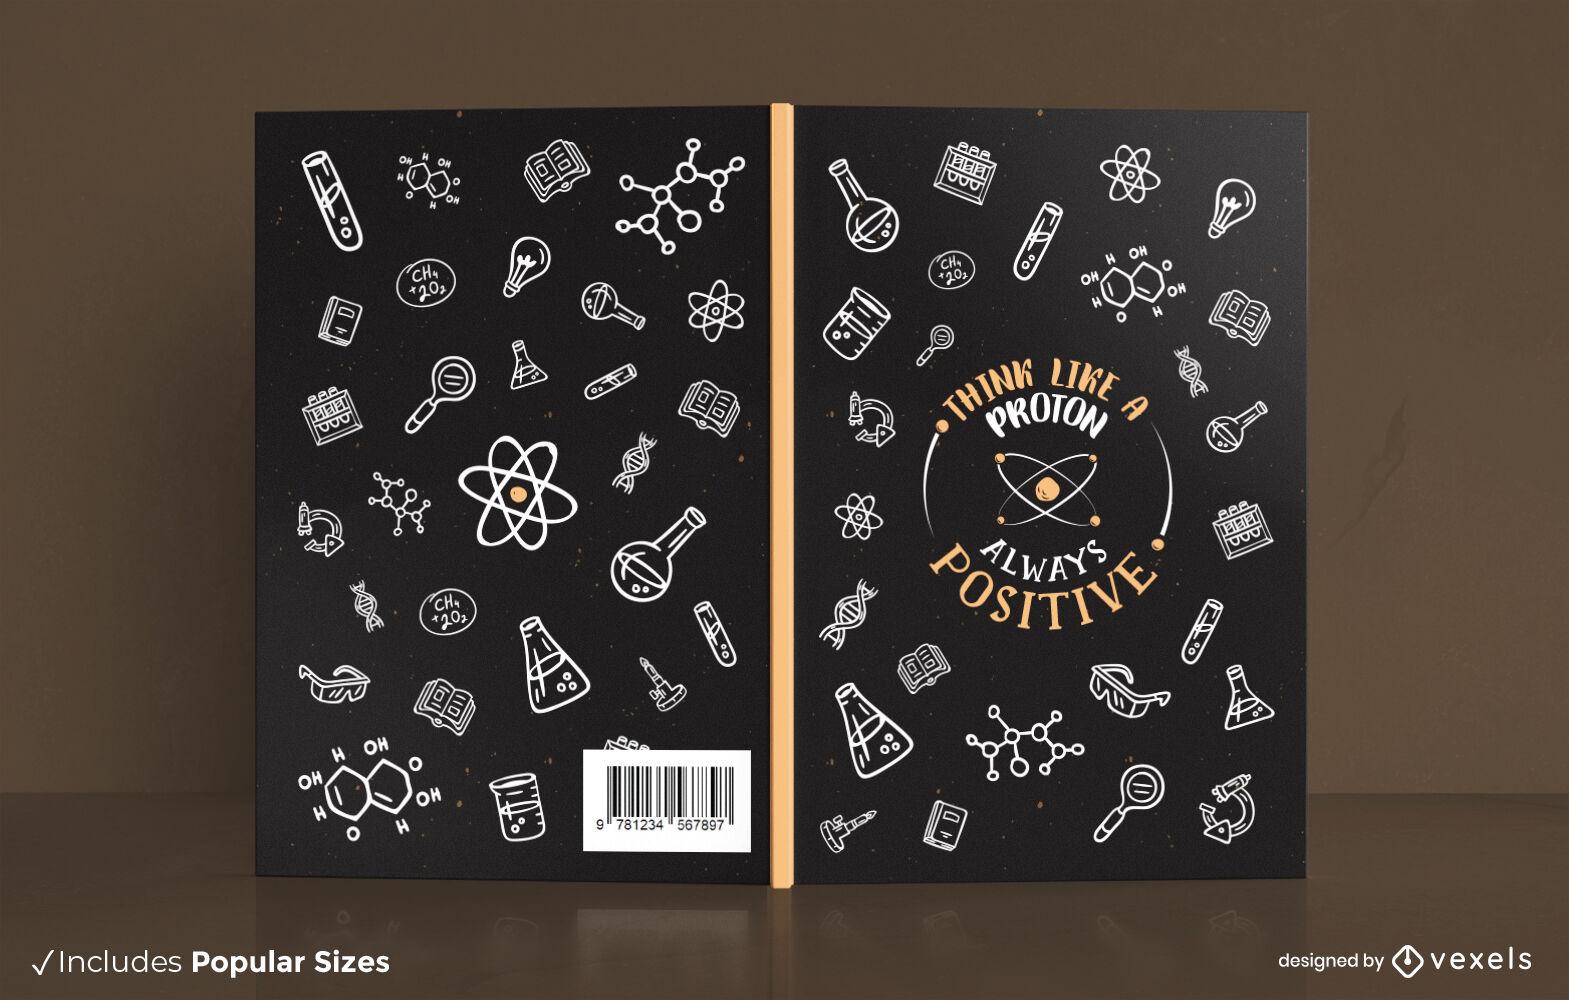 Dise?o de portada de elementos de ciencia qu?mica.